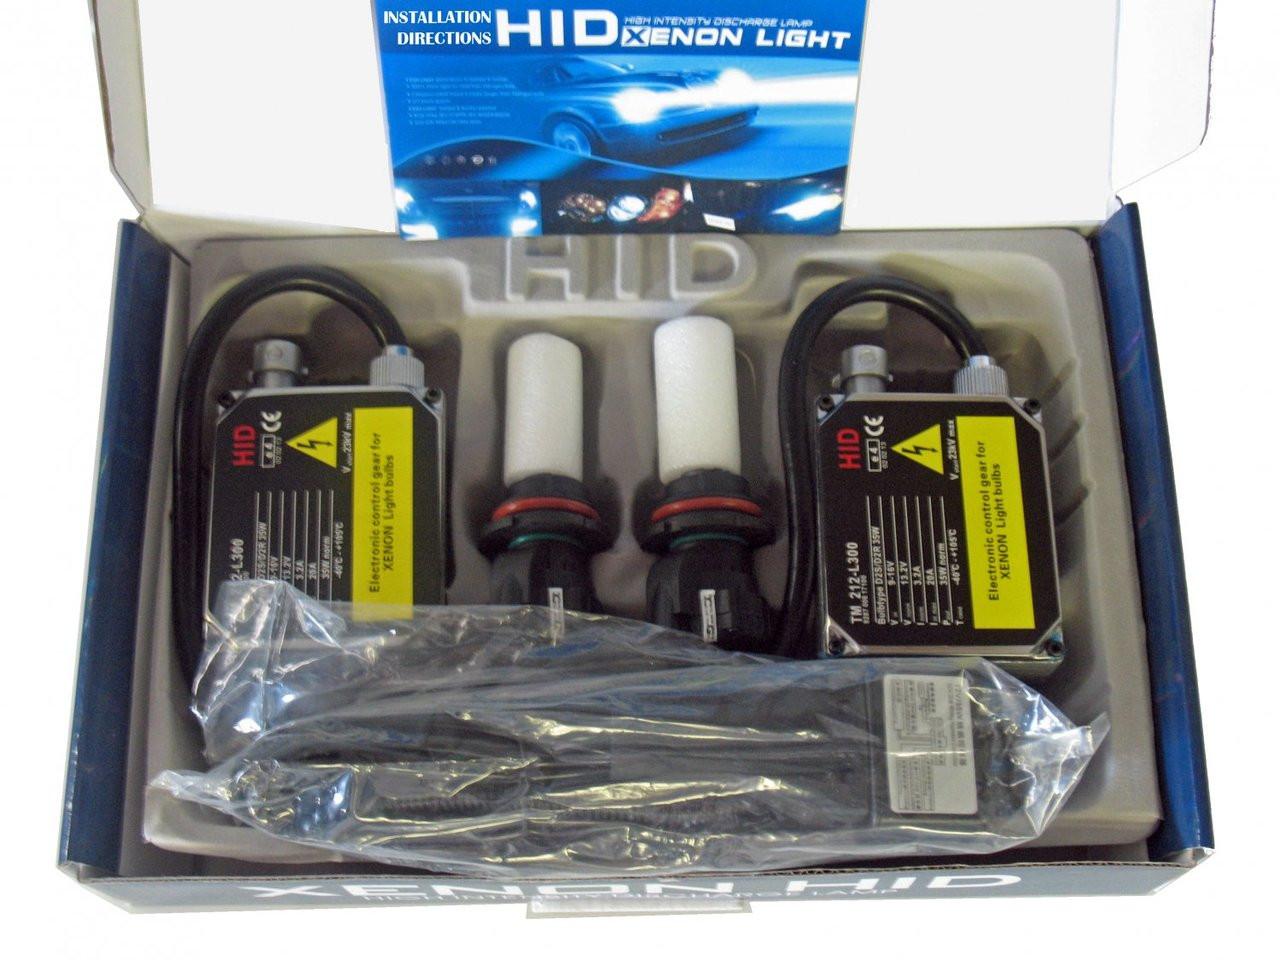 8,000K 55W H6M Bixenon Medium Blue HID Conversion Kit